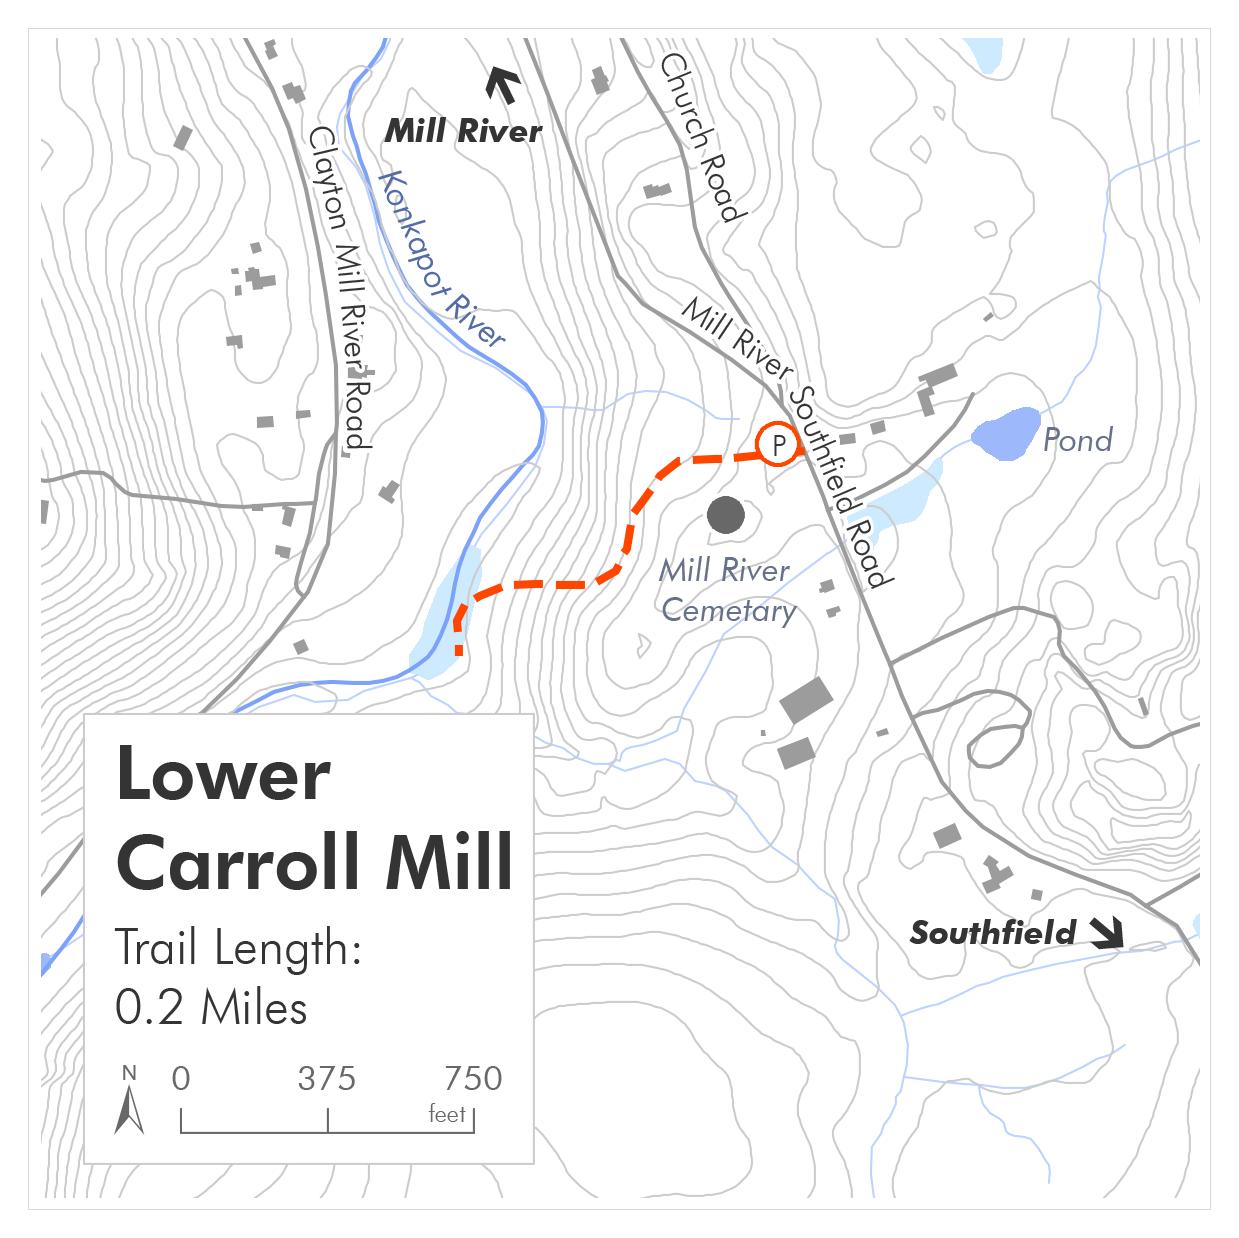 Lower_Carrol_Mill-2.png